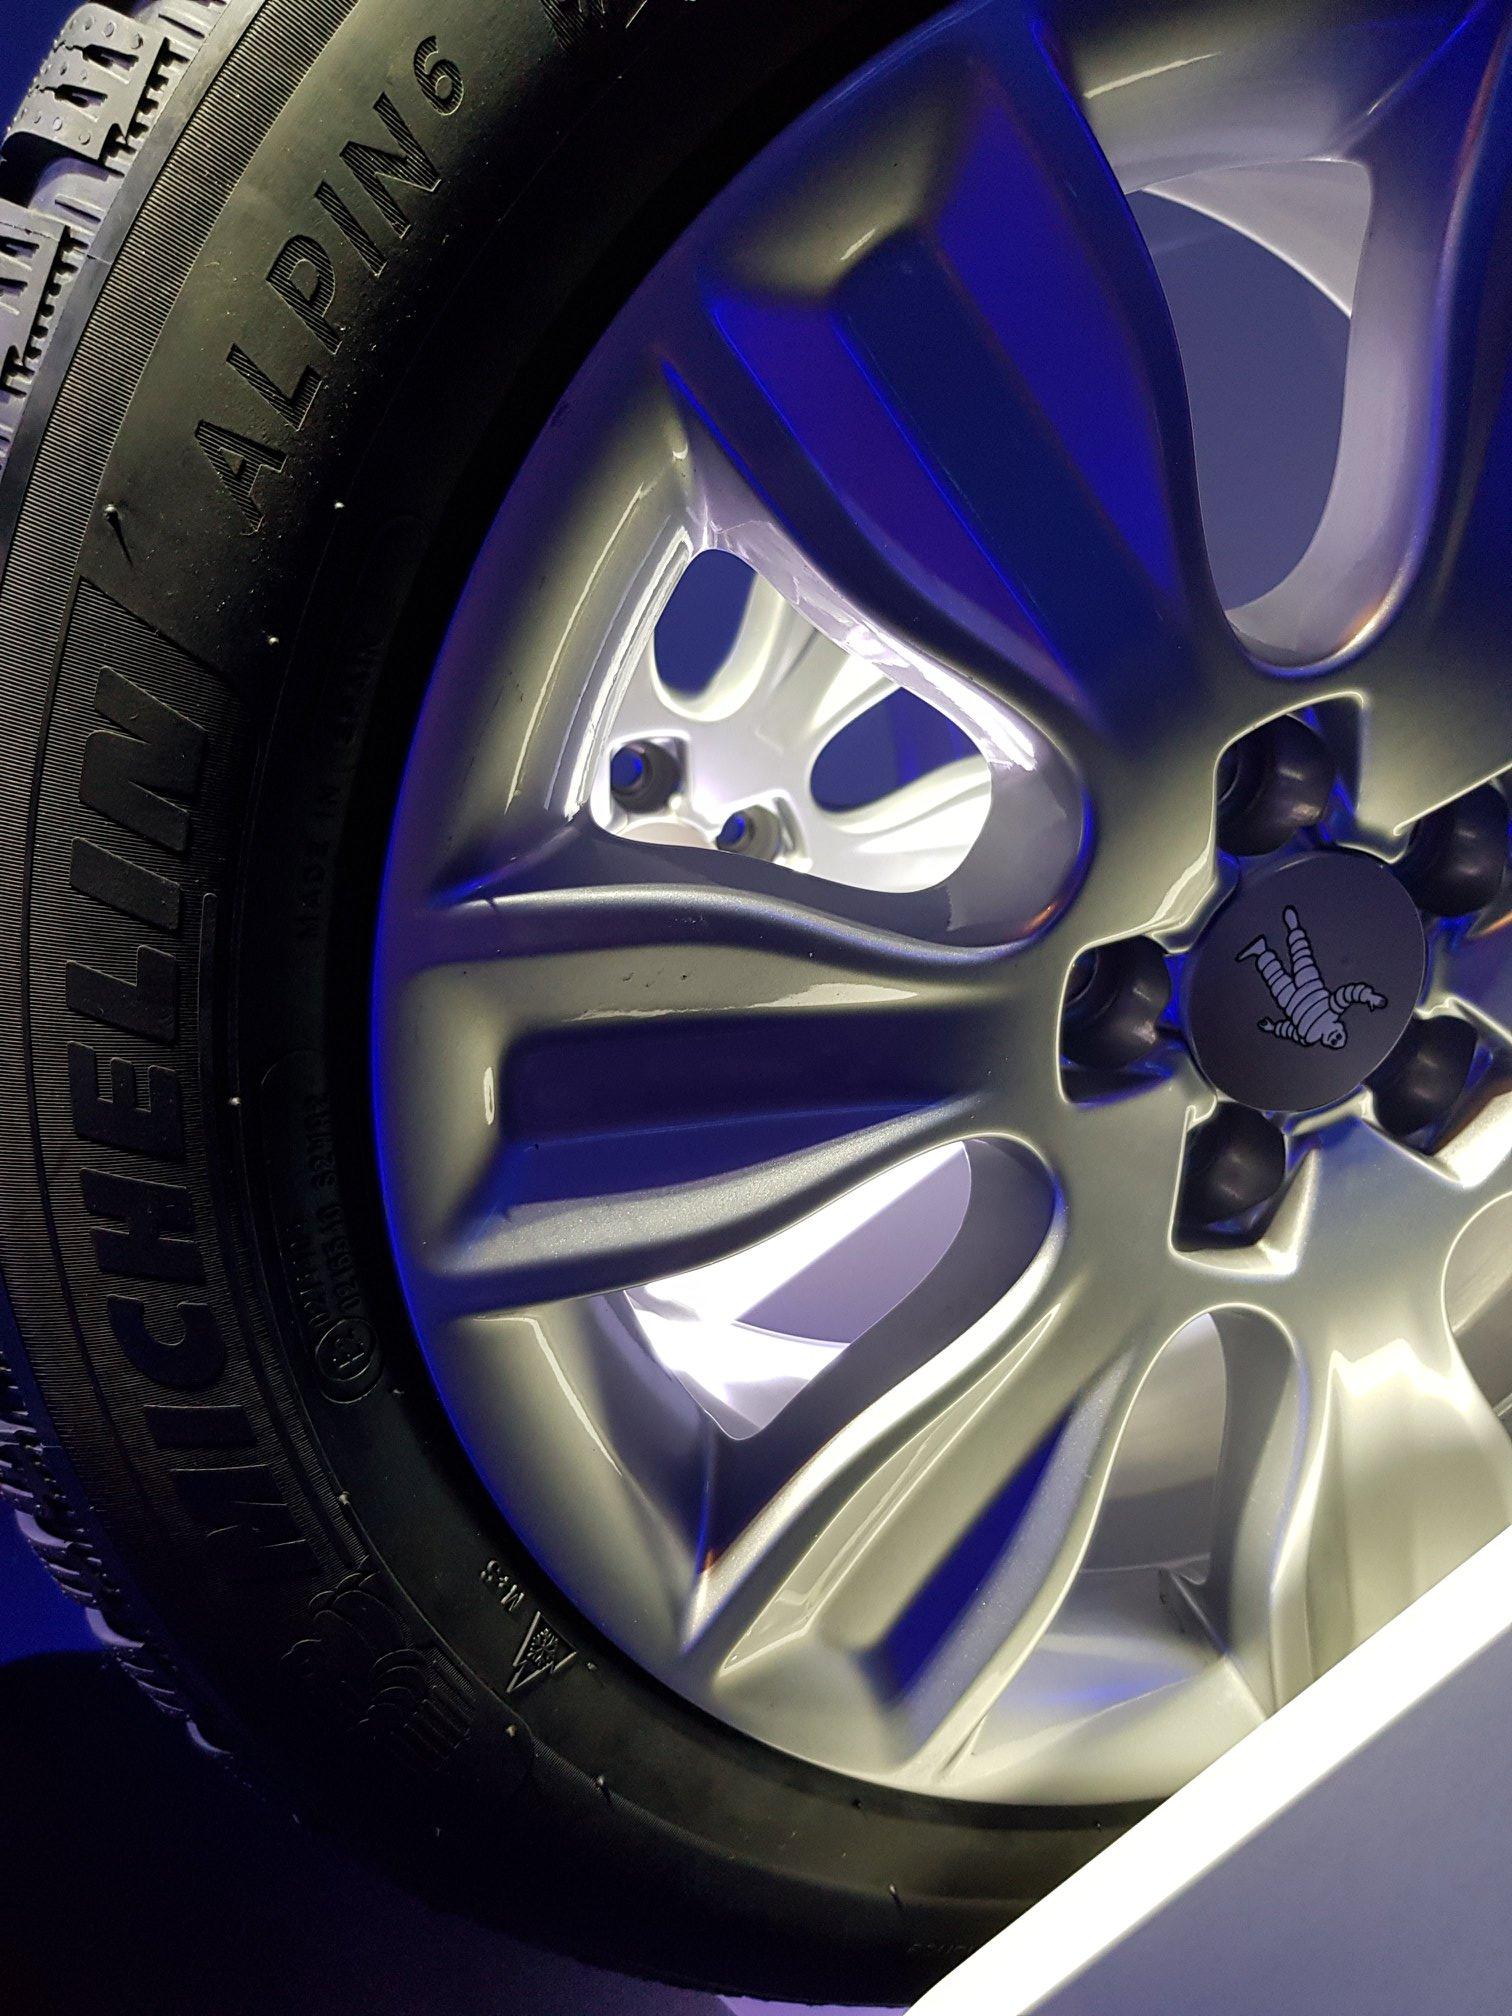 Noile anvelope de iarna Michelin Alpin 6